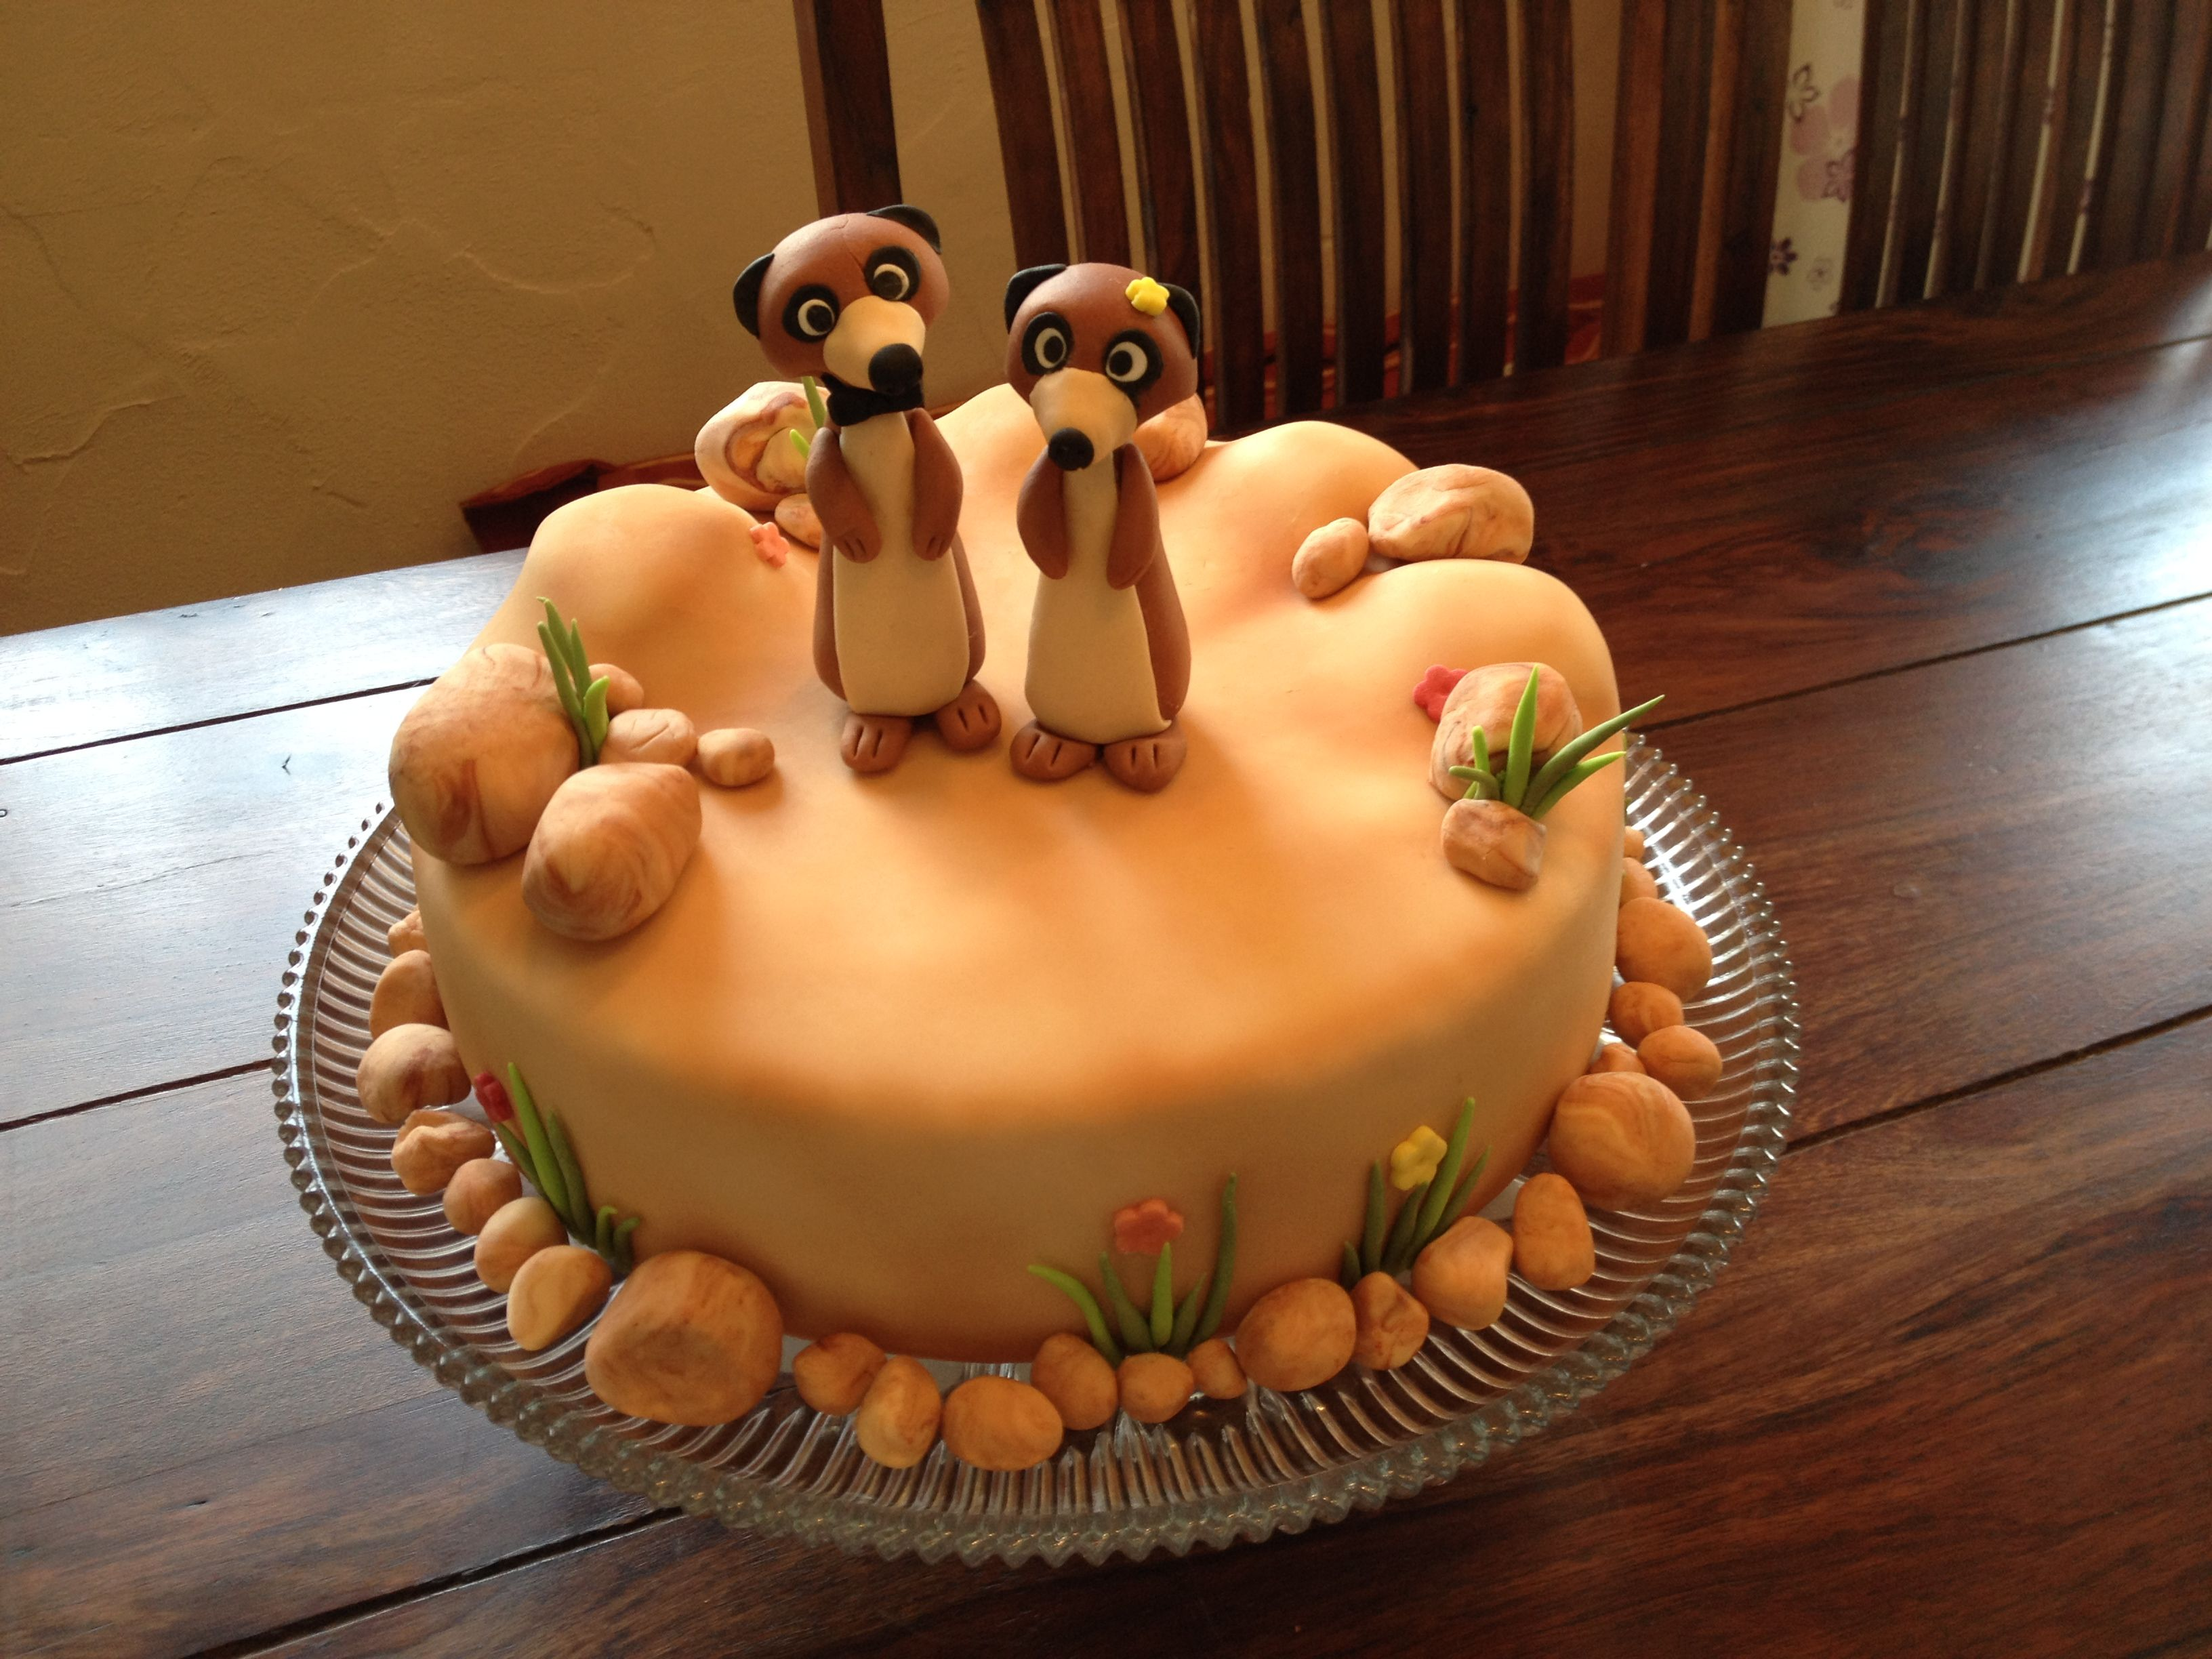 Meerkat Cake In 2019 Celebration Cakes Chocolate Cake Cake